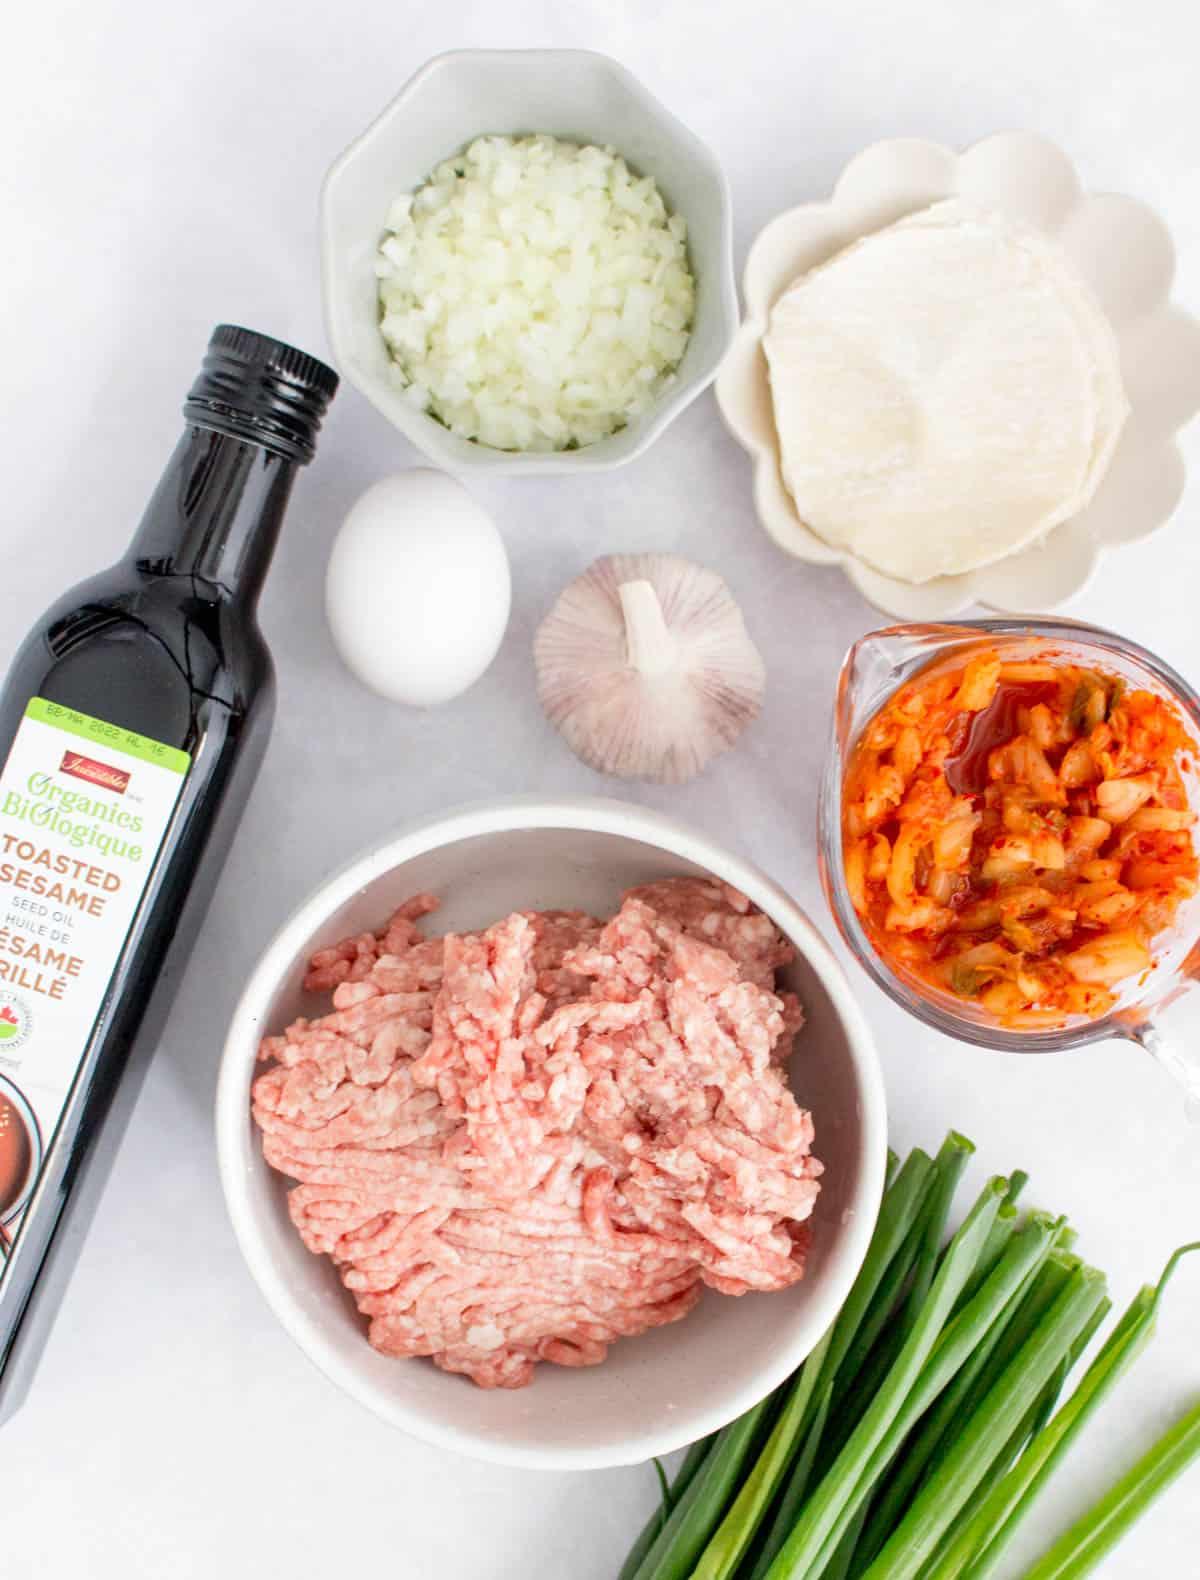 Overhead view of ingredients for kimchi pork dumplings.